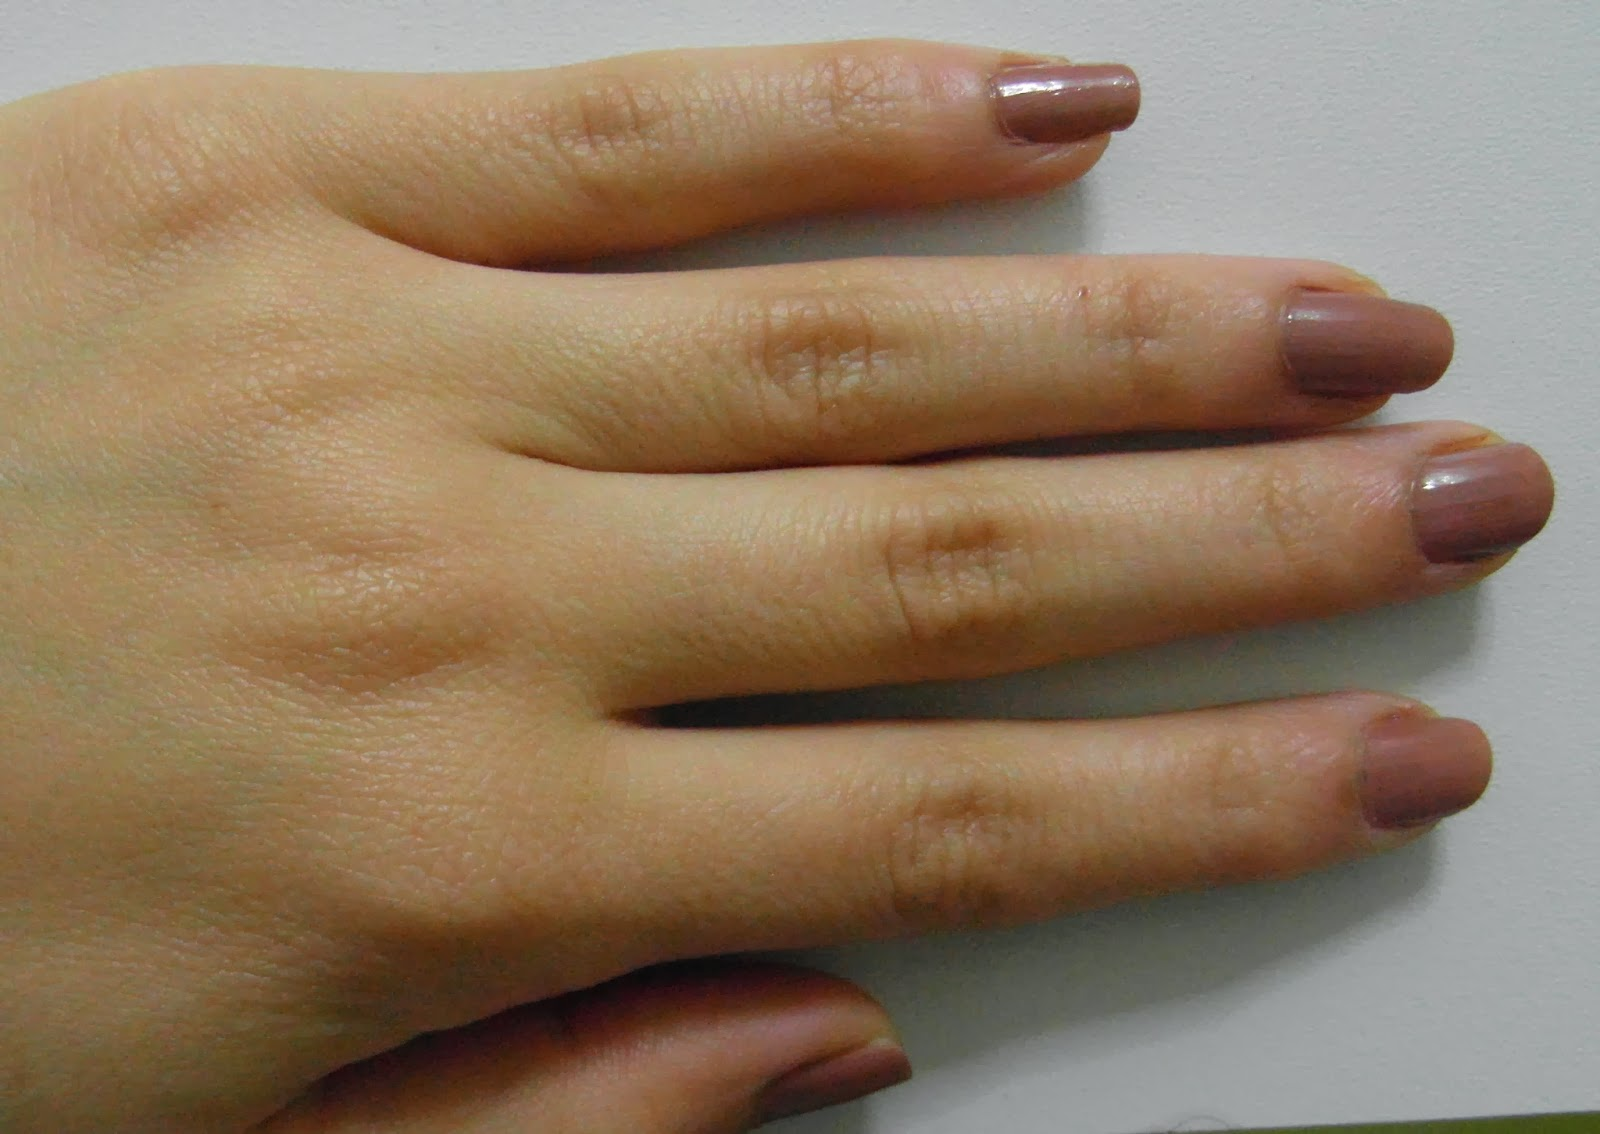 CarolCosmos: Estee Lauder Pure Color Nail Lacquer in So Vain